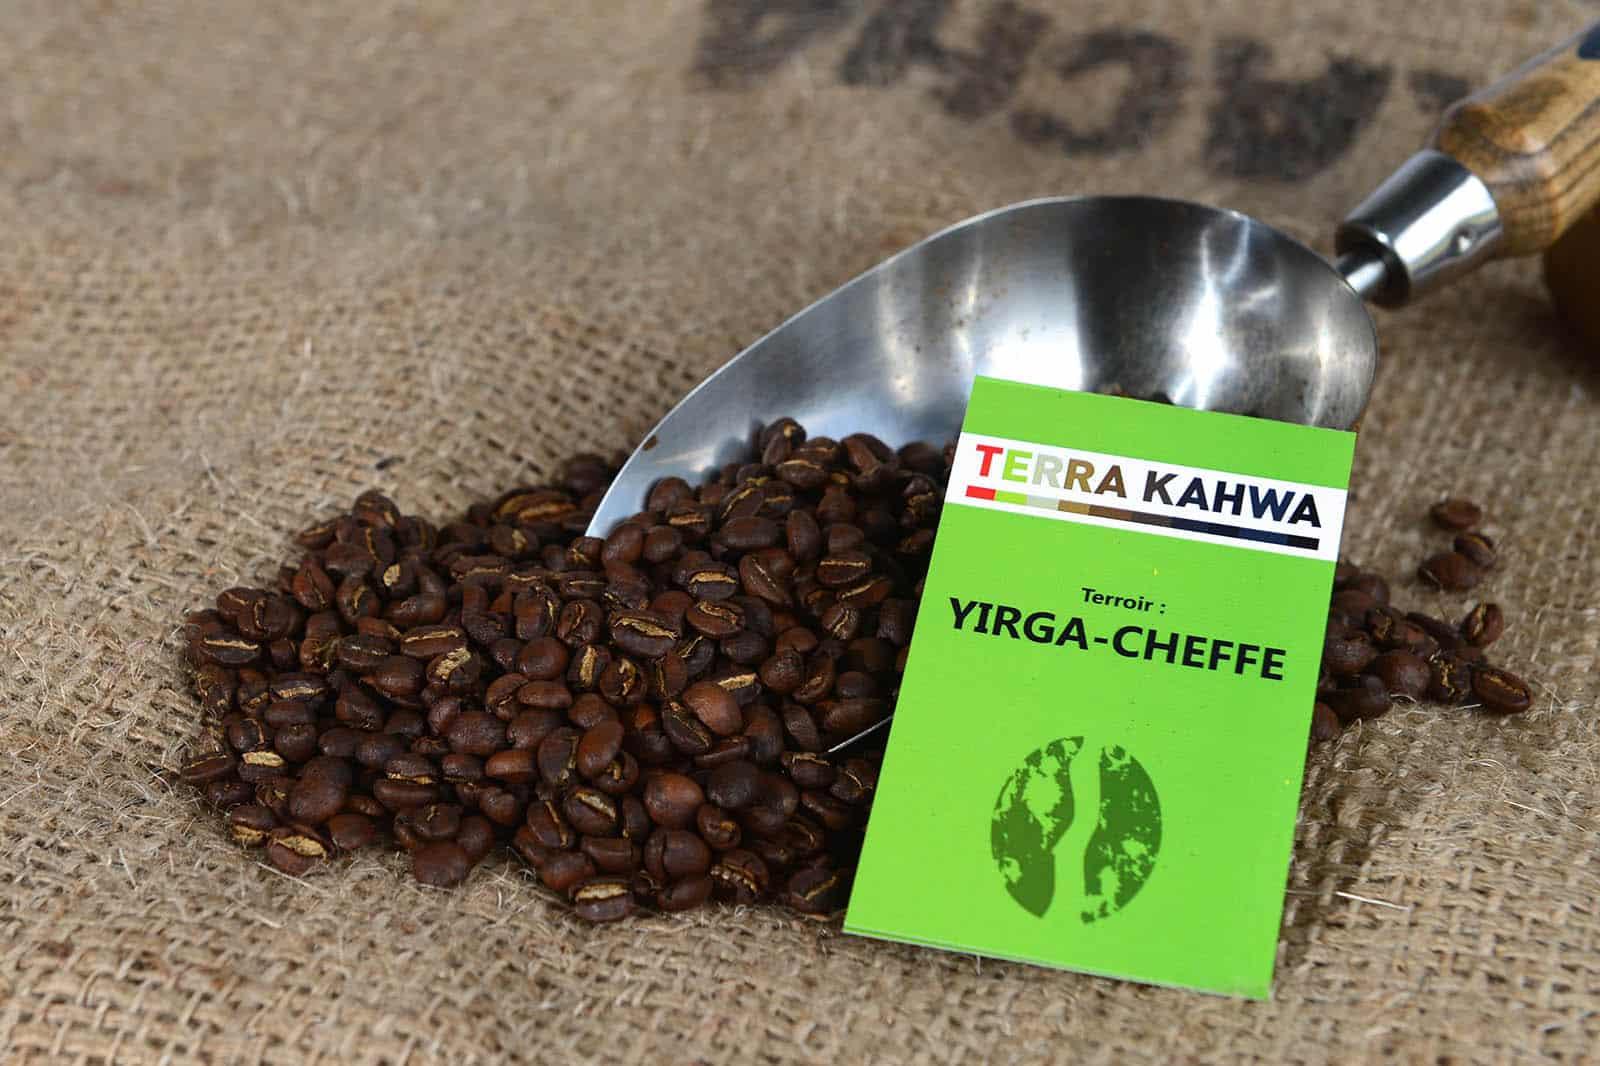 caf torr fi yirga cheffe caf d ethiopie origine certifi e terra kahwa 500g terra kahwa. Black Bedroom Furniture Sets. Home Design Ideas